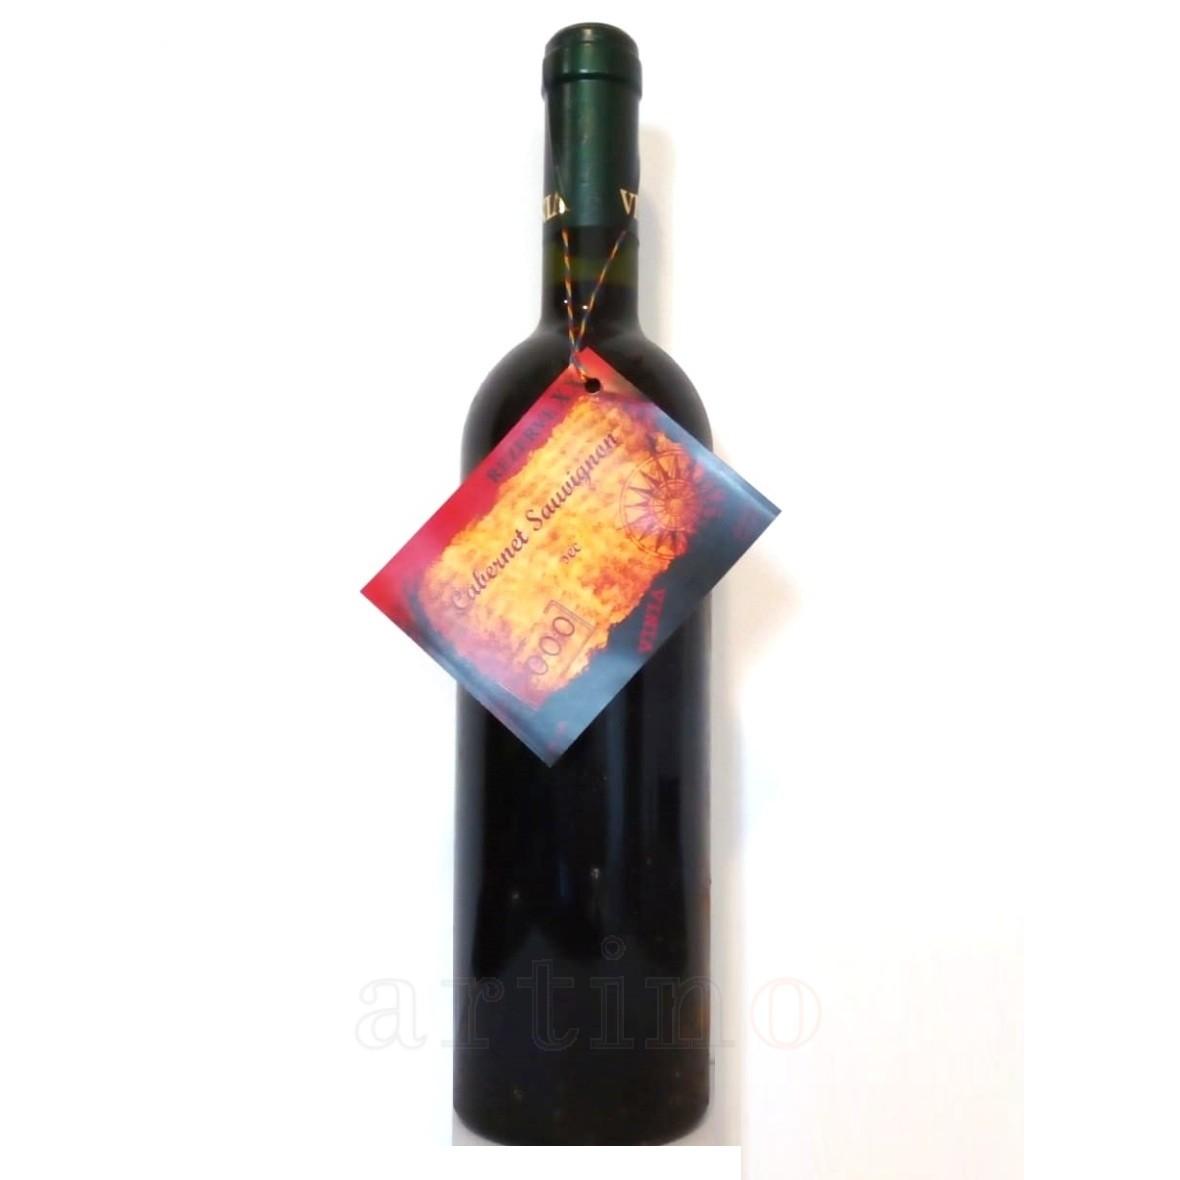 Vin colectie 2000 Cabernet Sauvignon, Uricani